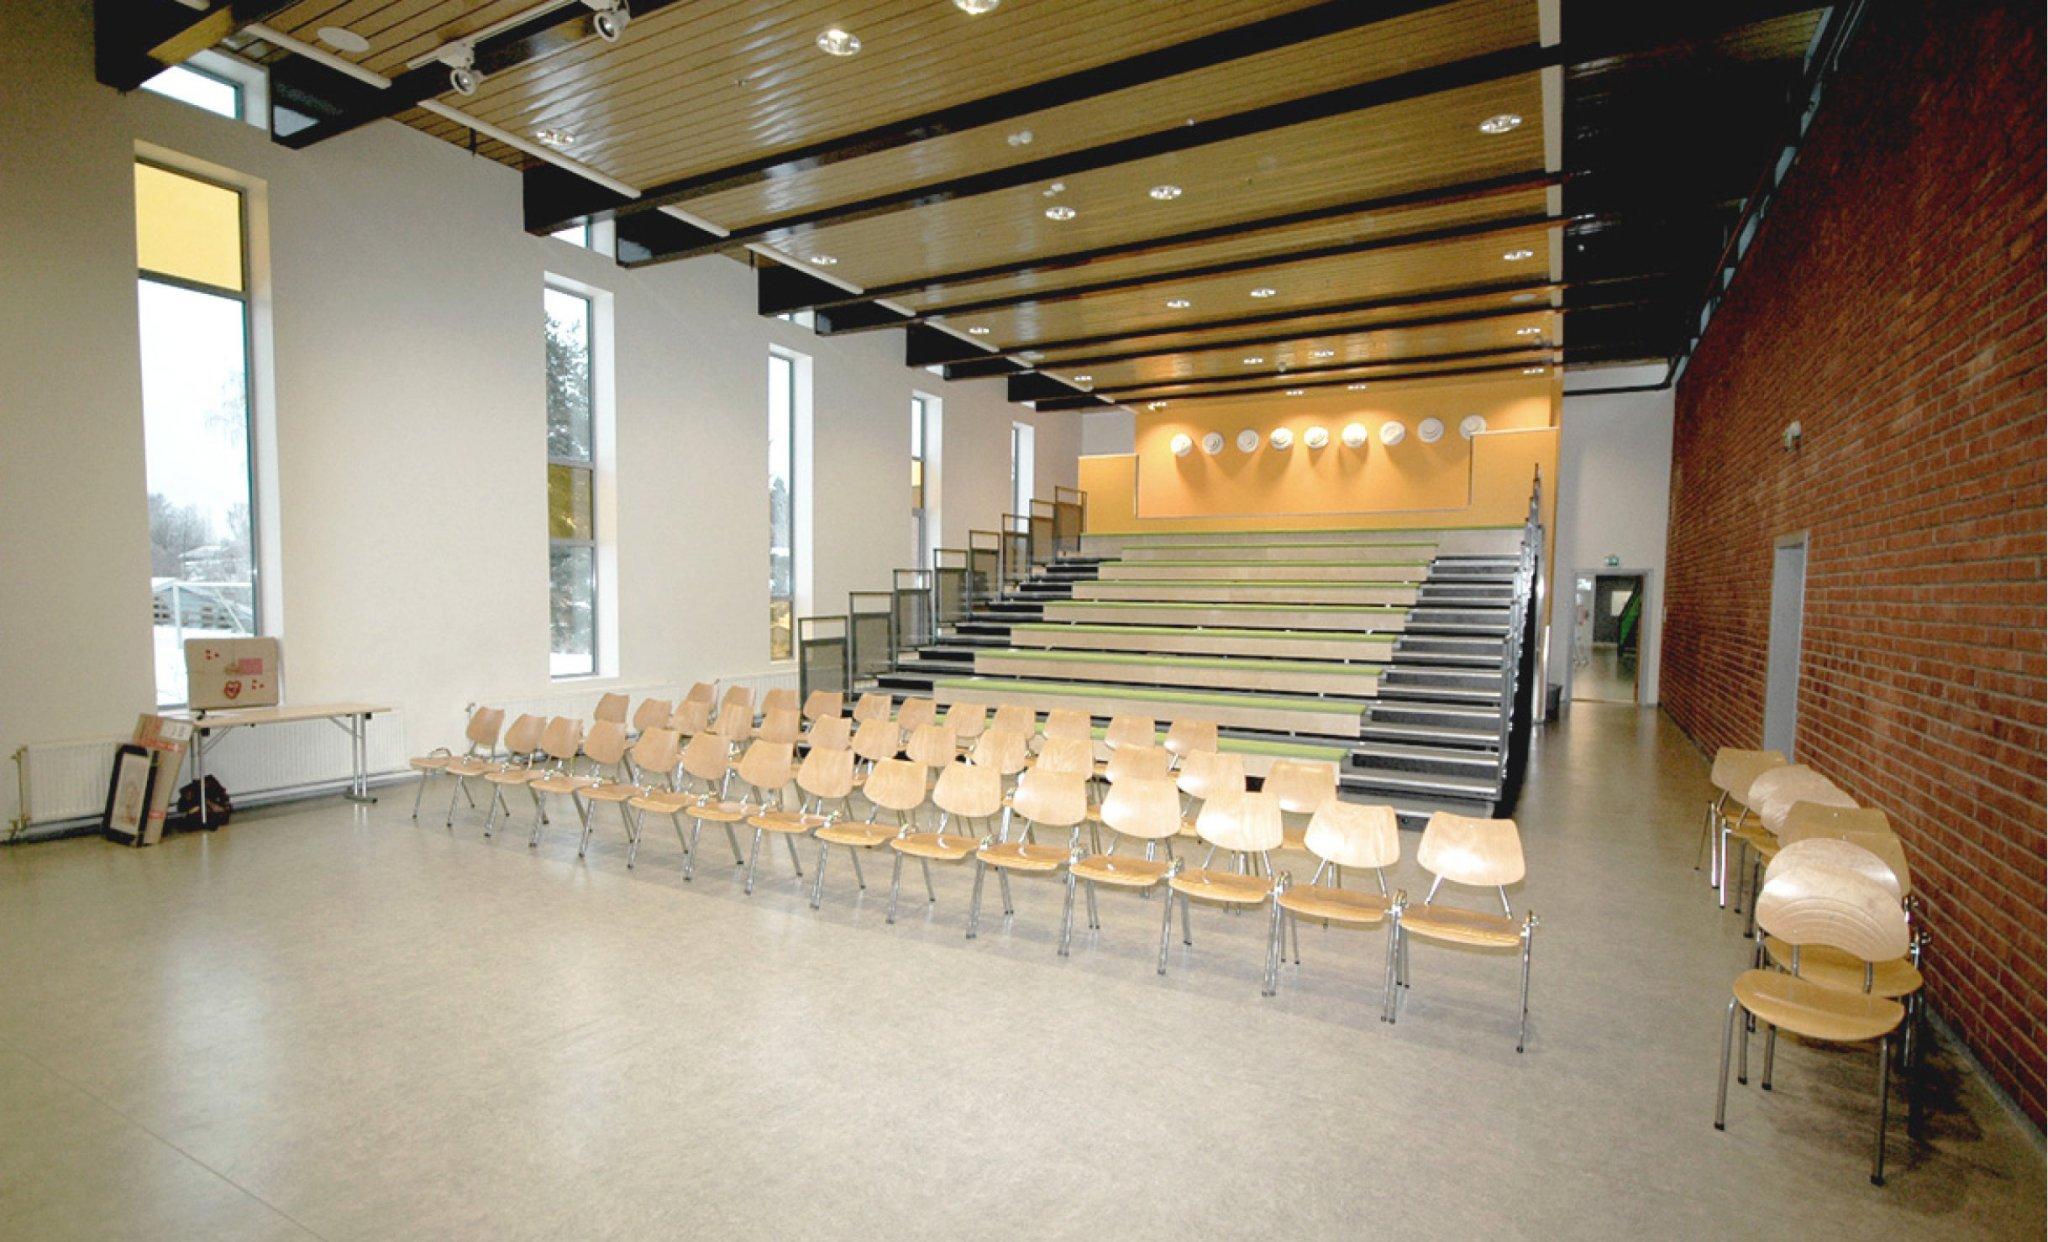 8e883c34 Spydeberg ungdomsskole – Enerhaugen Arkitektkontor